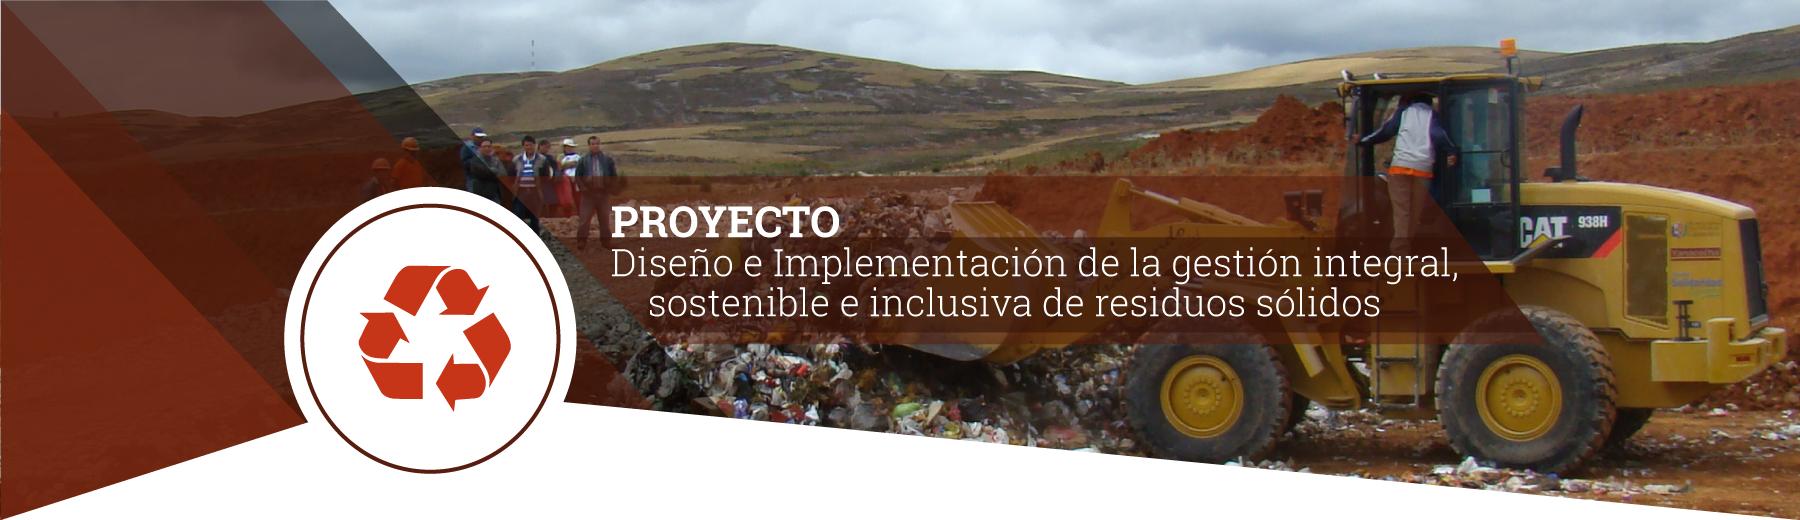 proyecto1-44